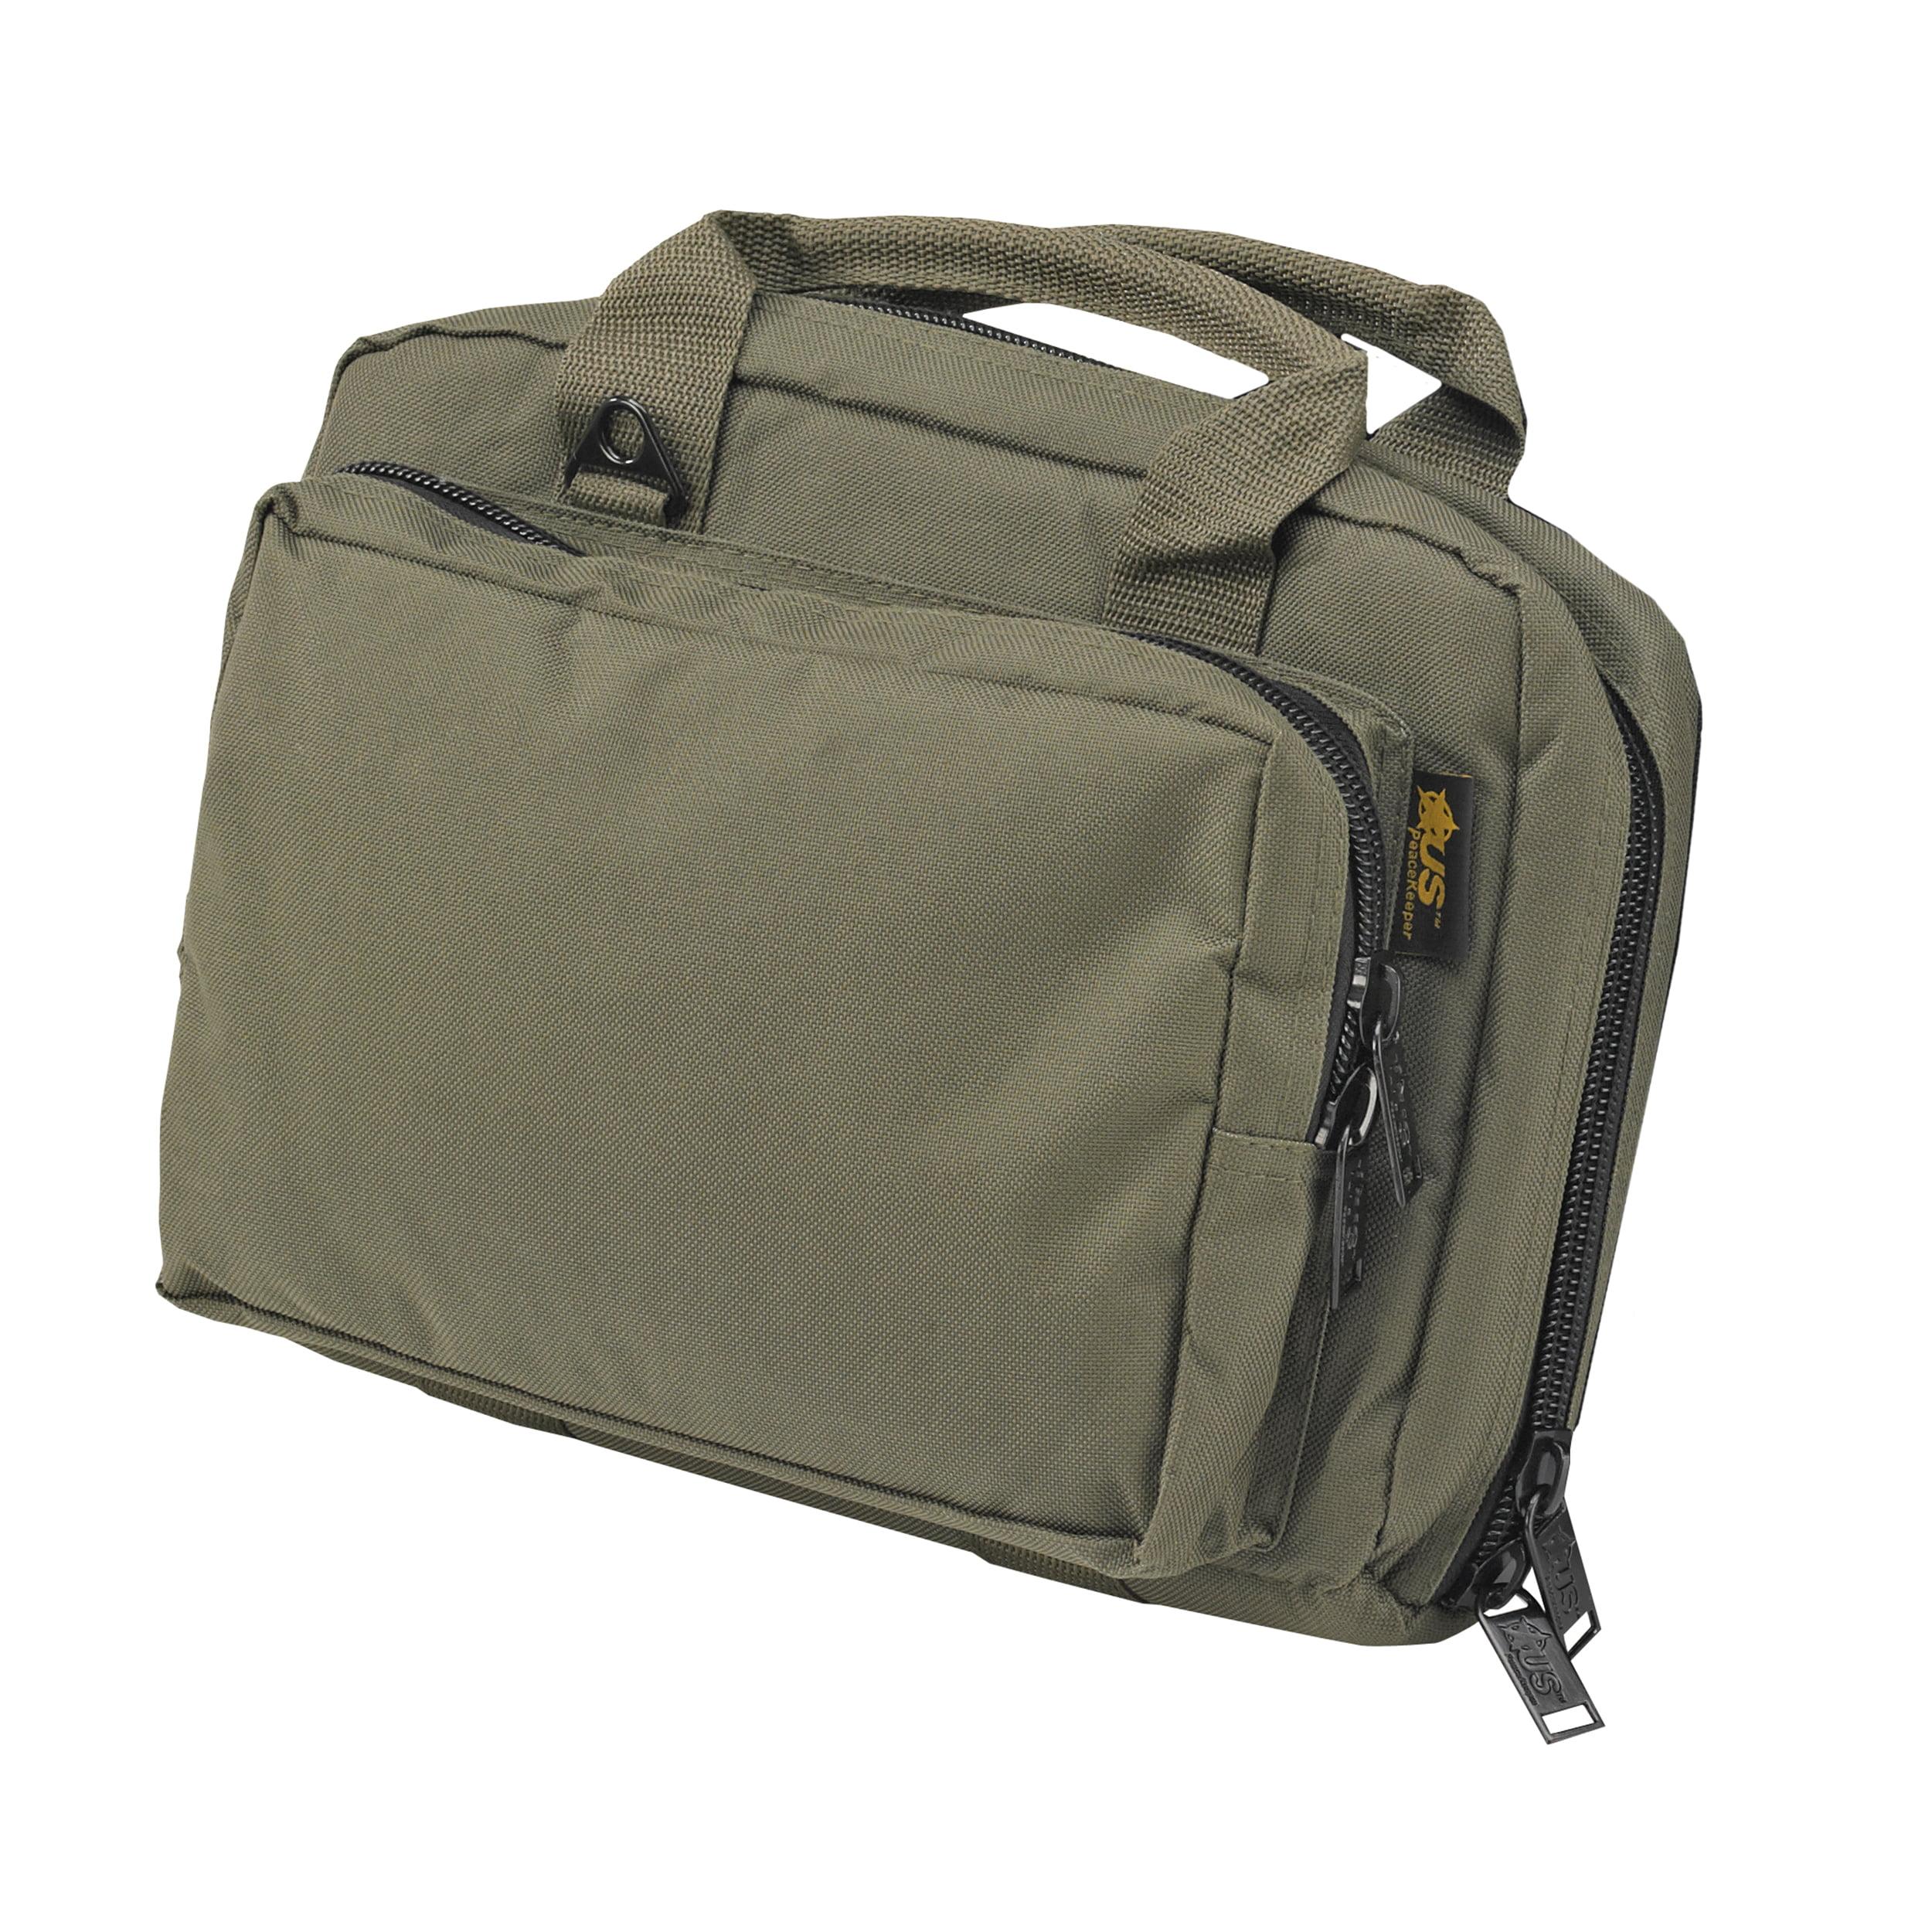 US Peacekeeper P21106 Mini-Range Pistol Bag with Strap, Pistol, OD Green